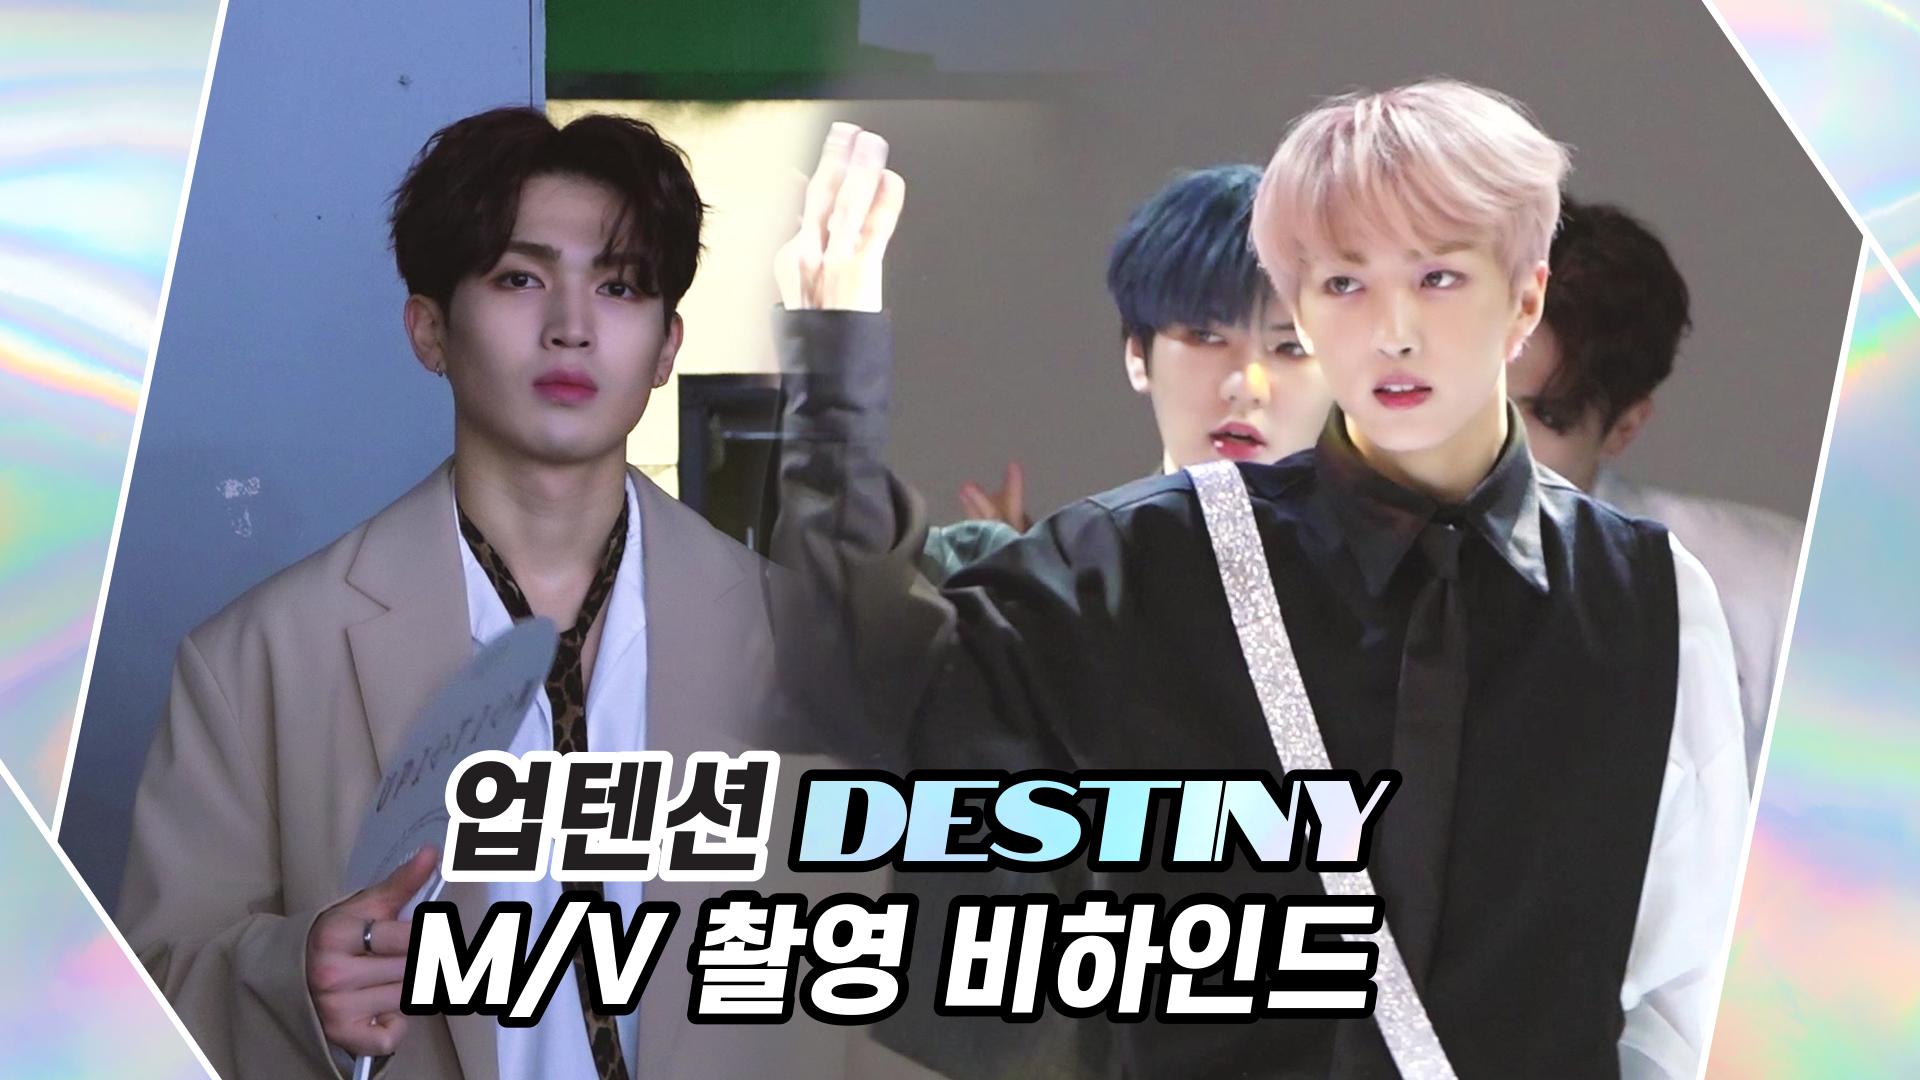 U10TV ep 276 - 업텐션 'Destiny' M/V 촬영 비하인드! 🎥